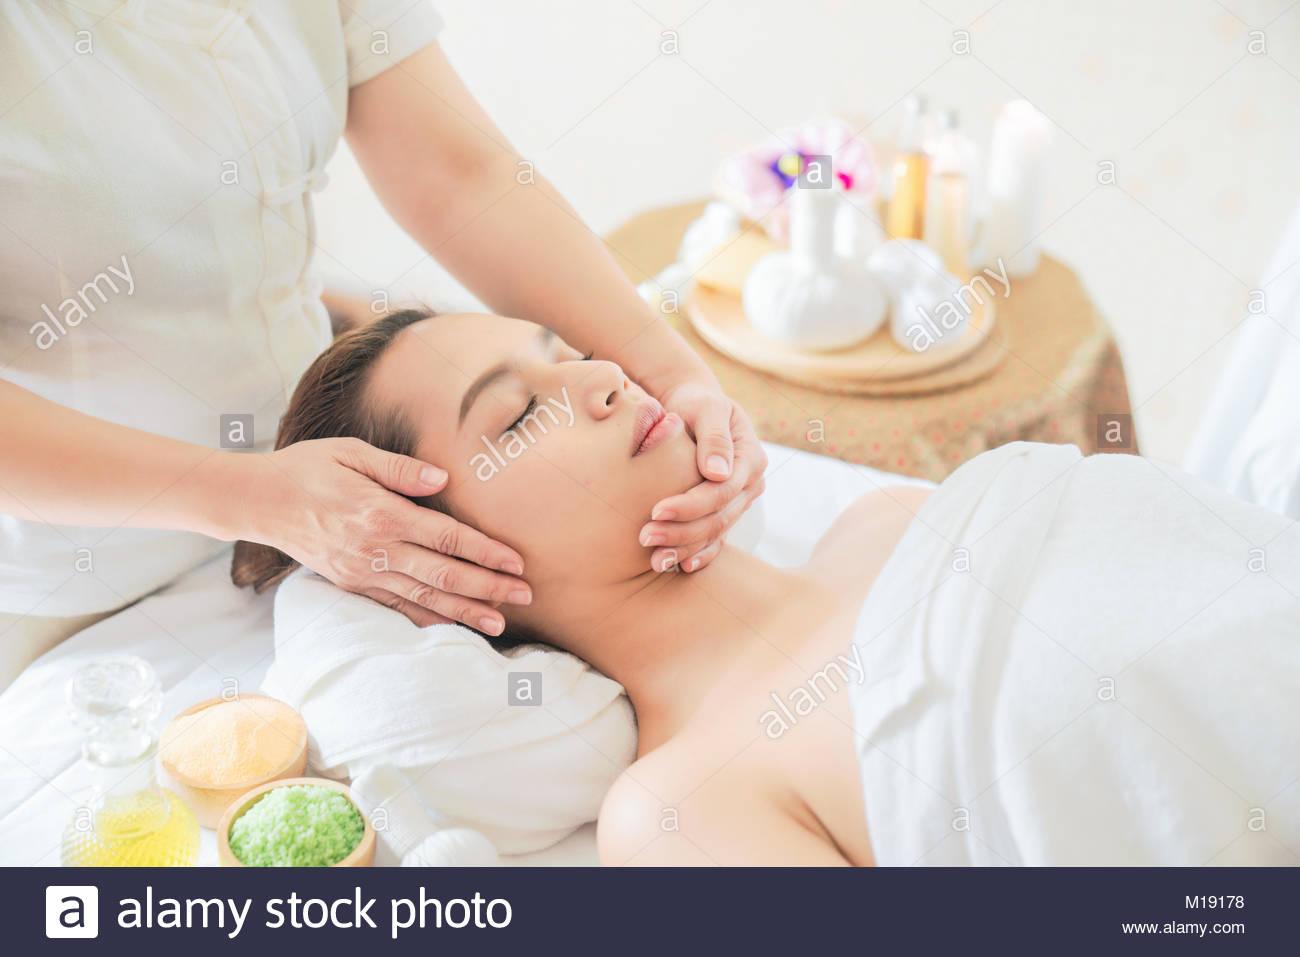 massage stockholm erotisk royal thai falkenberg